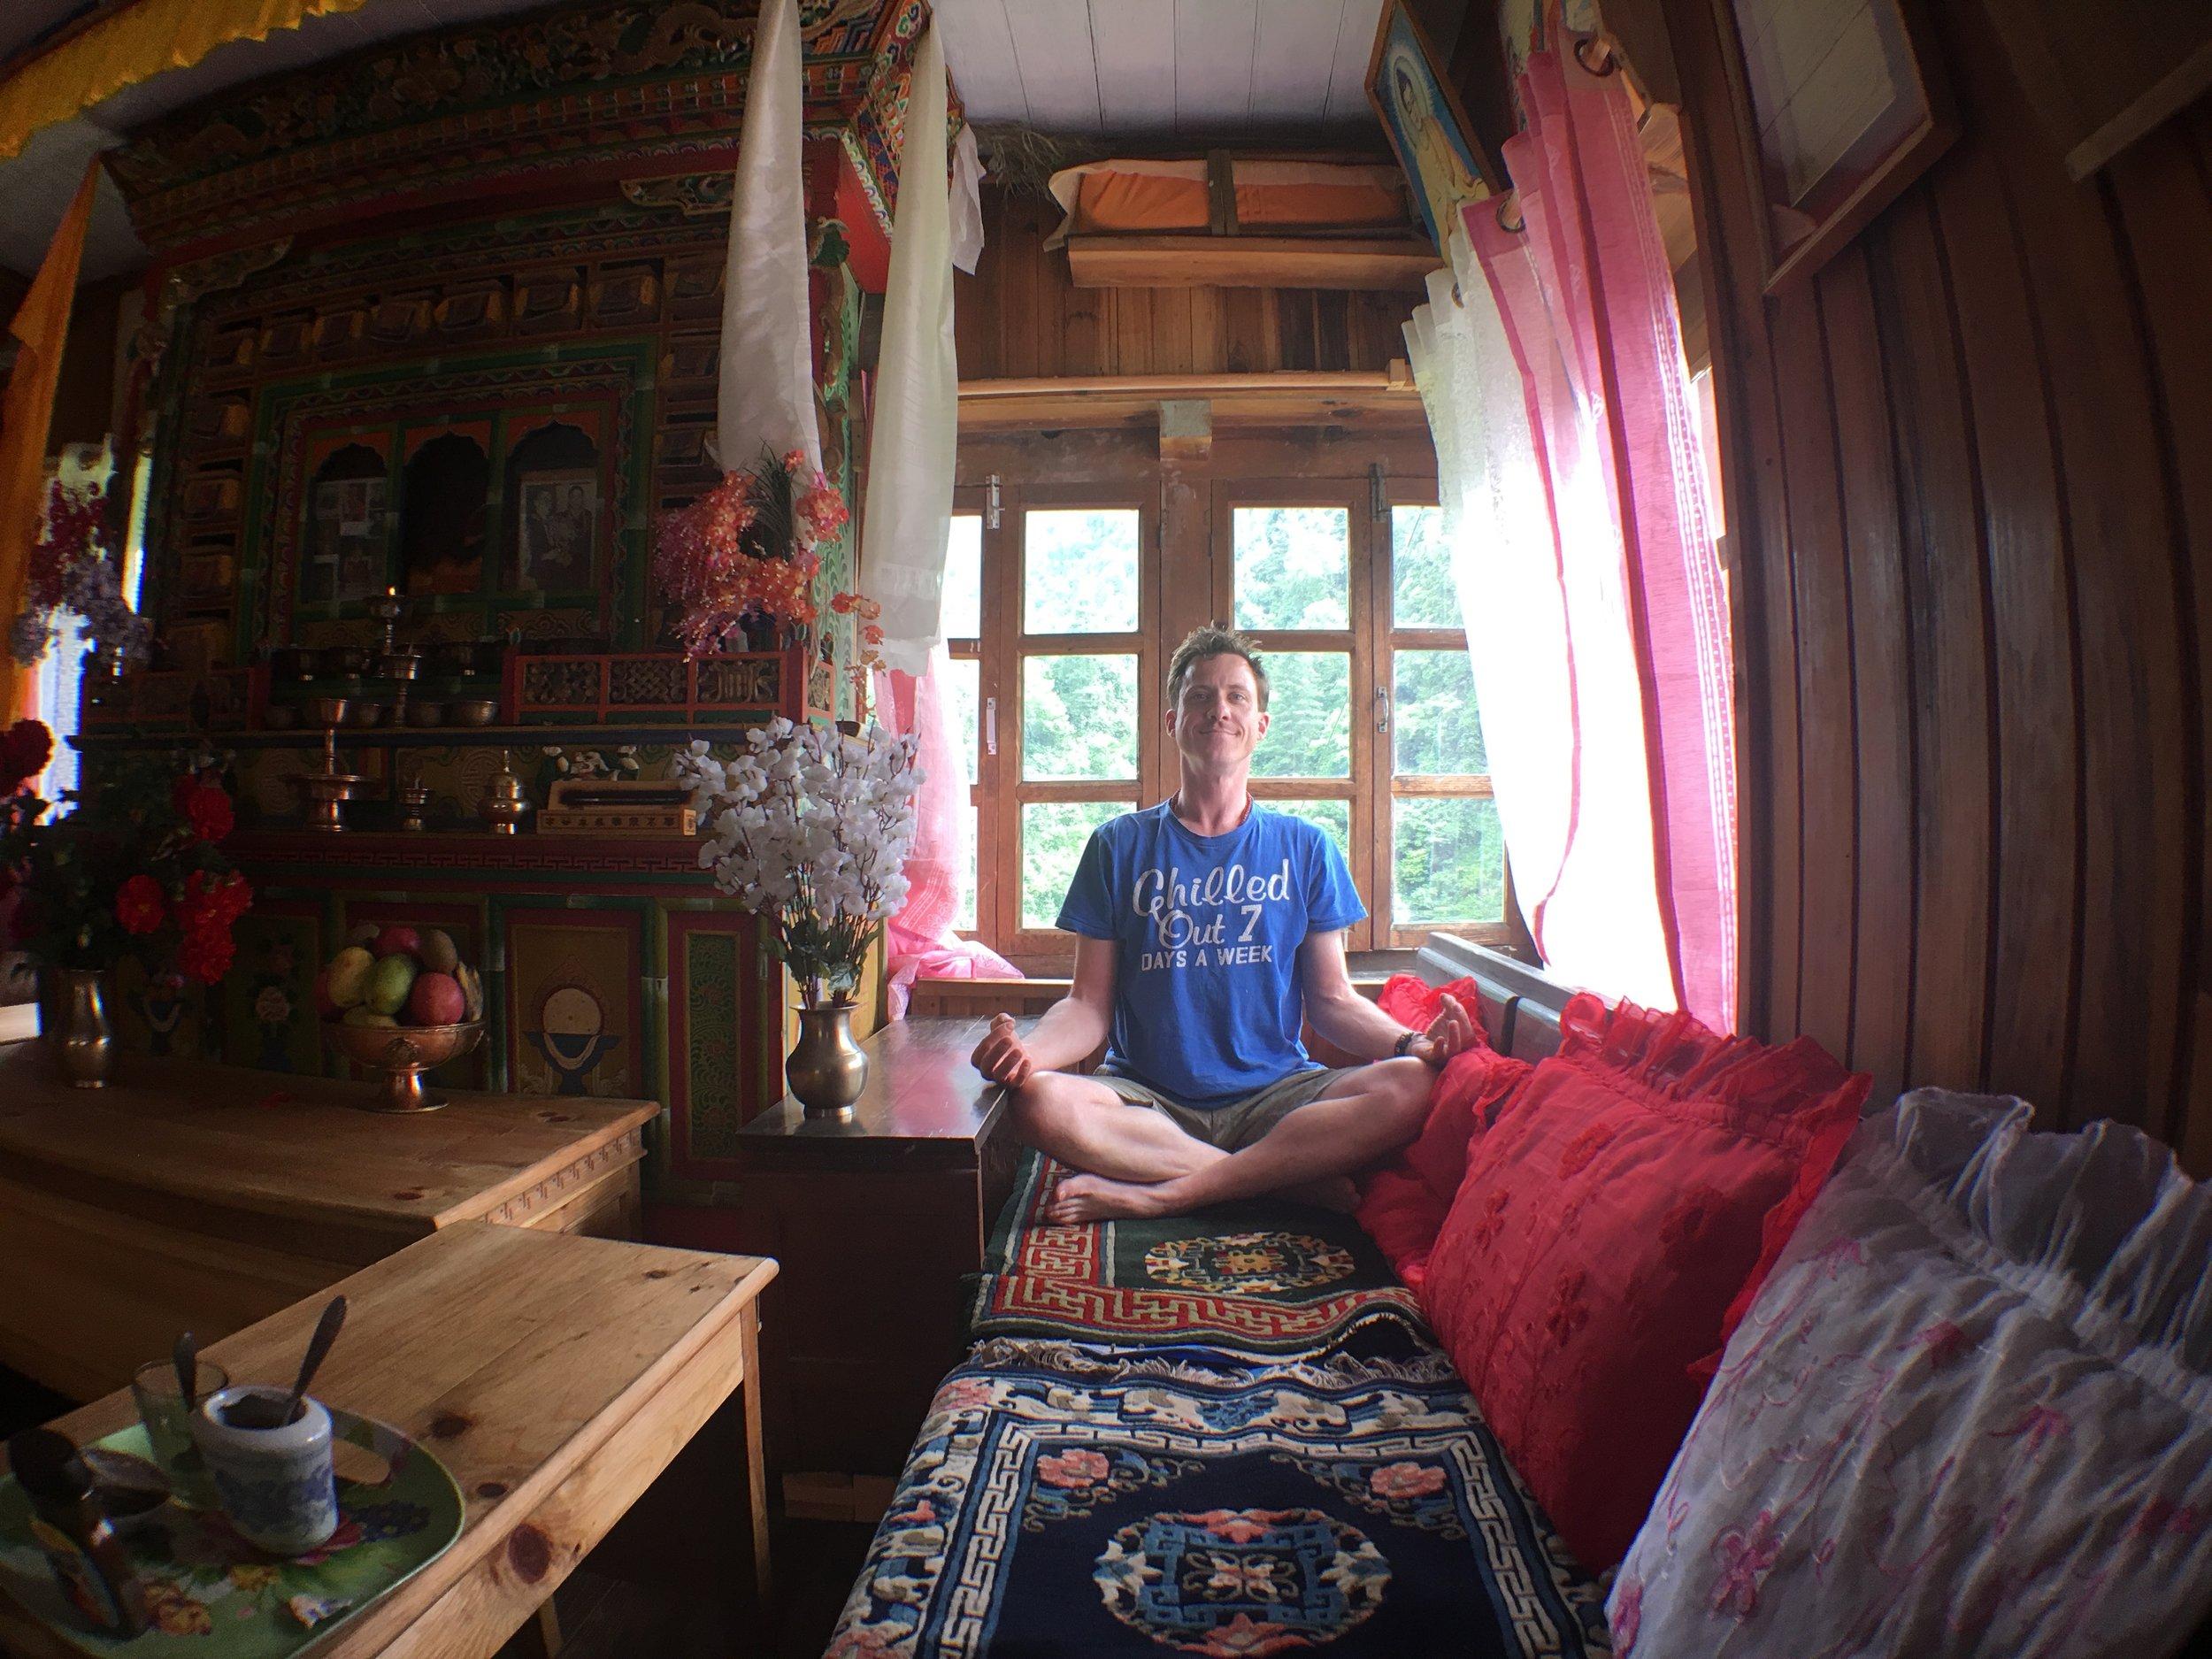 Owen levitating